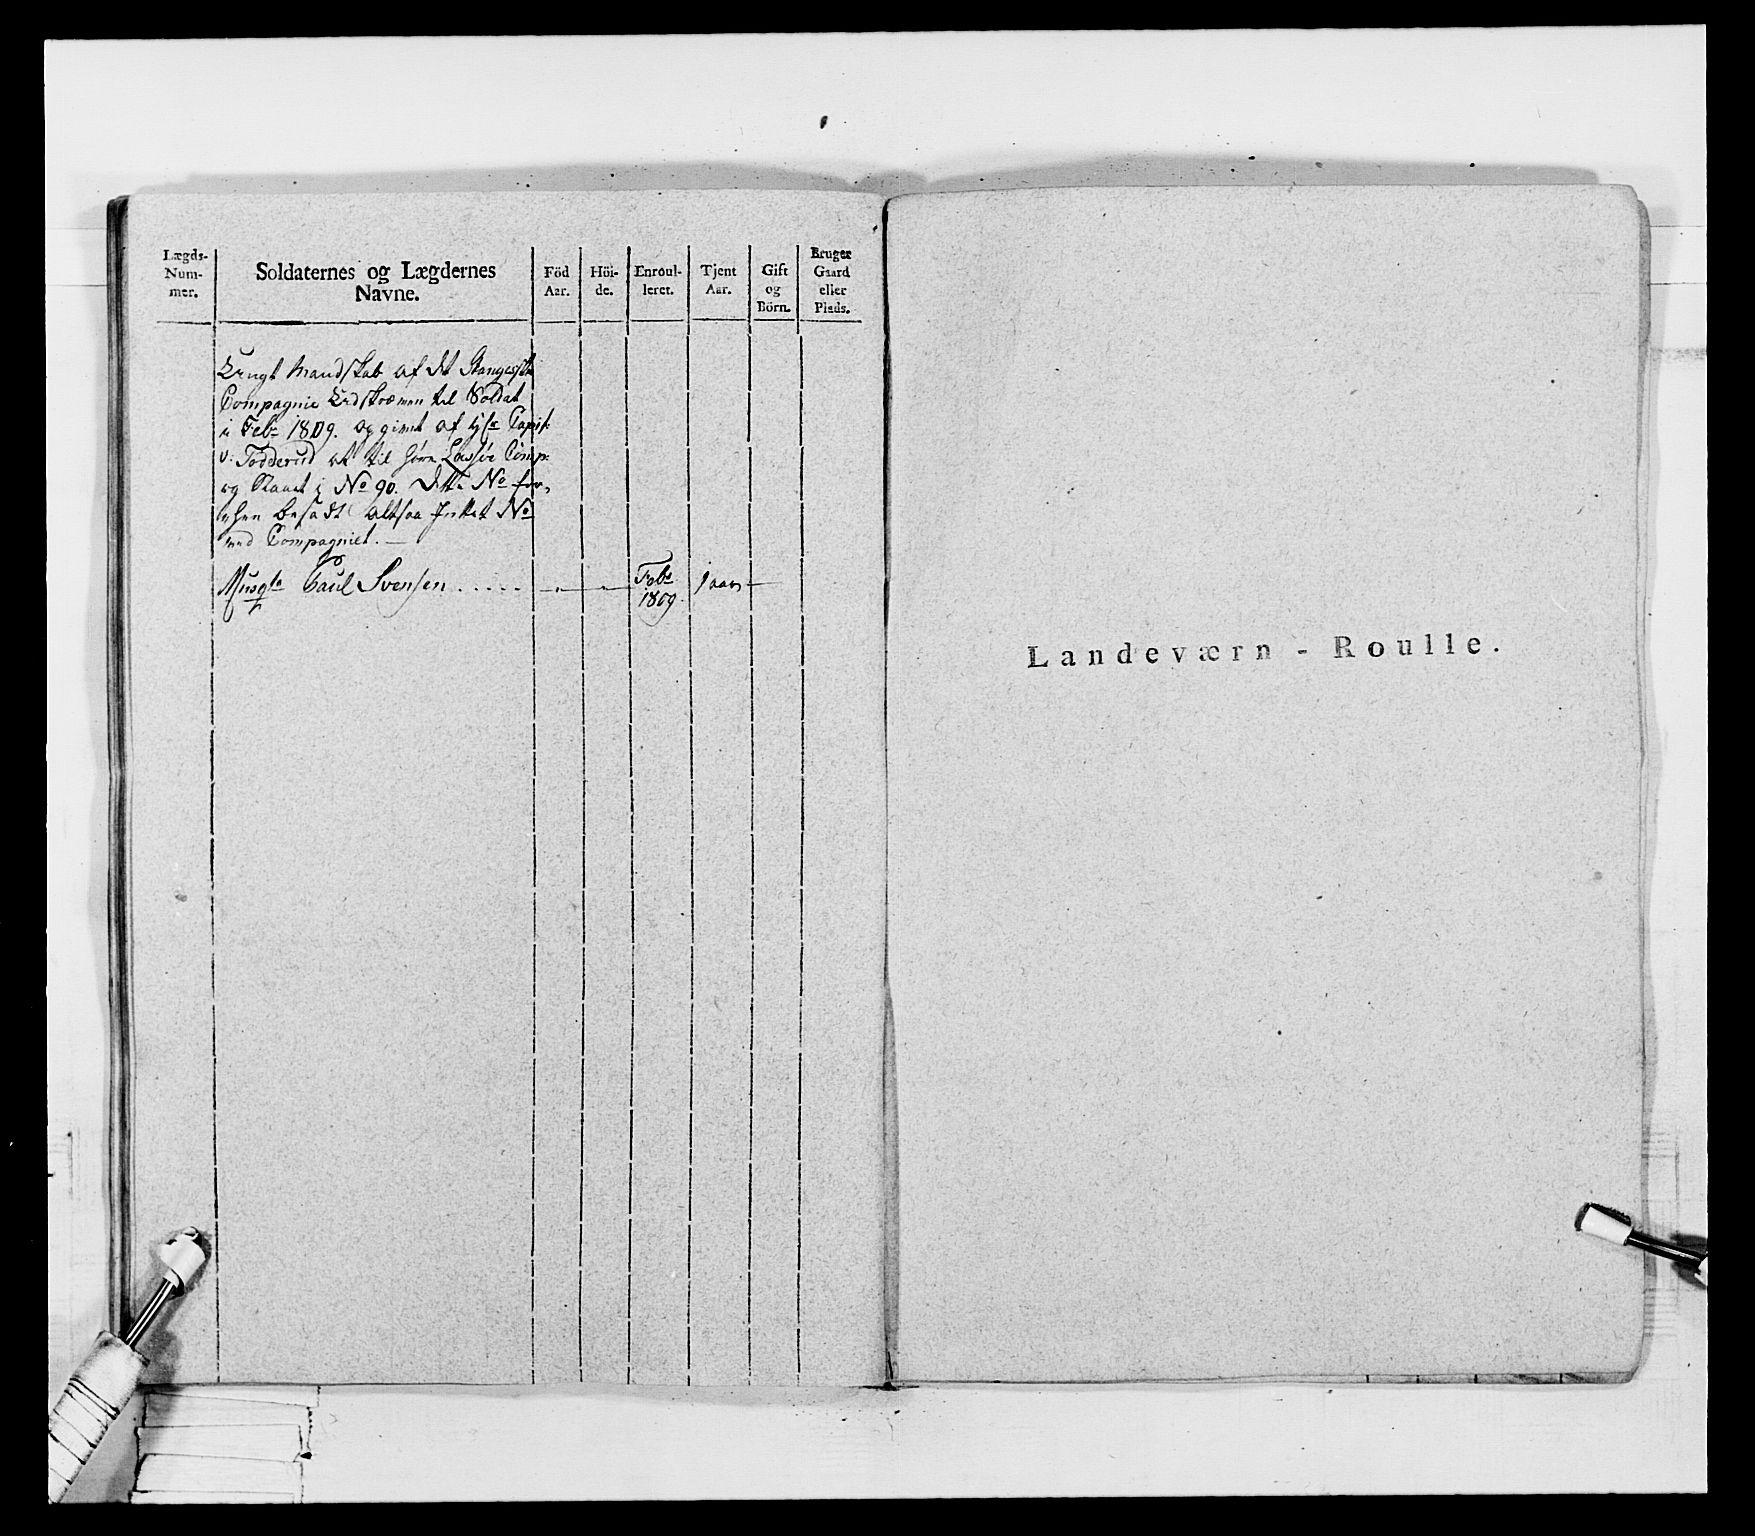 RA, Generalitets- og kommissariatskollegiet, Det kongelige norske kommissariatskollegium, E/Eh/L0069: Opplandske gevorbne infanteriregiment, 1810-1818, s. 297